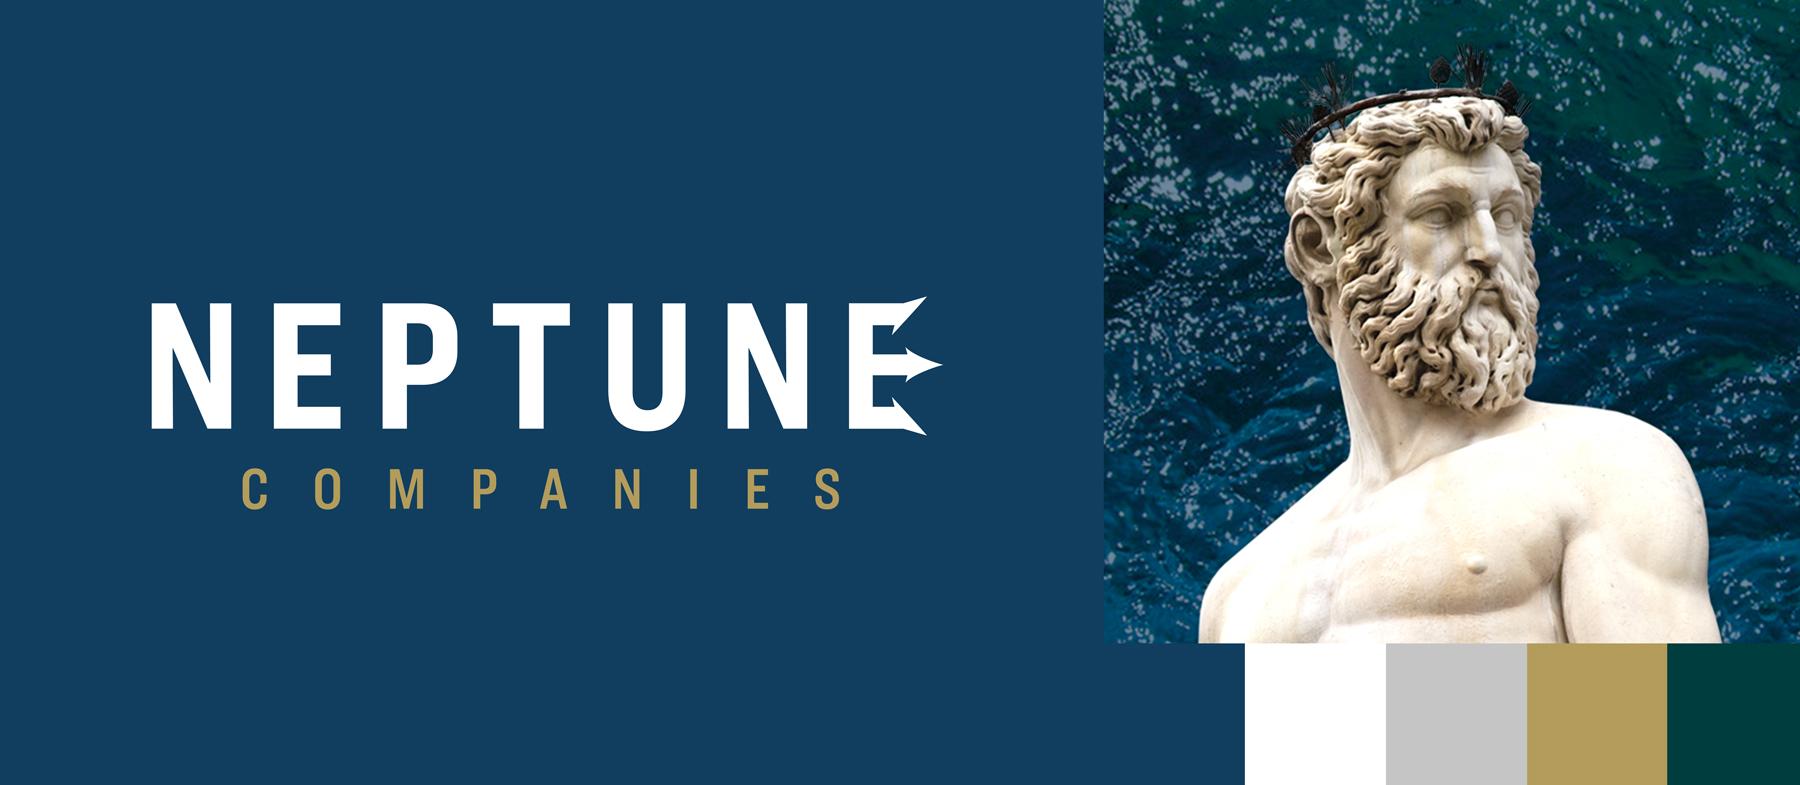 Neptune Companies Logo Maiocco Design Co.